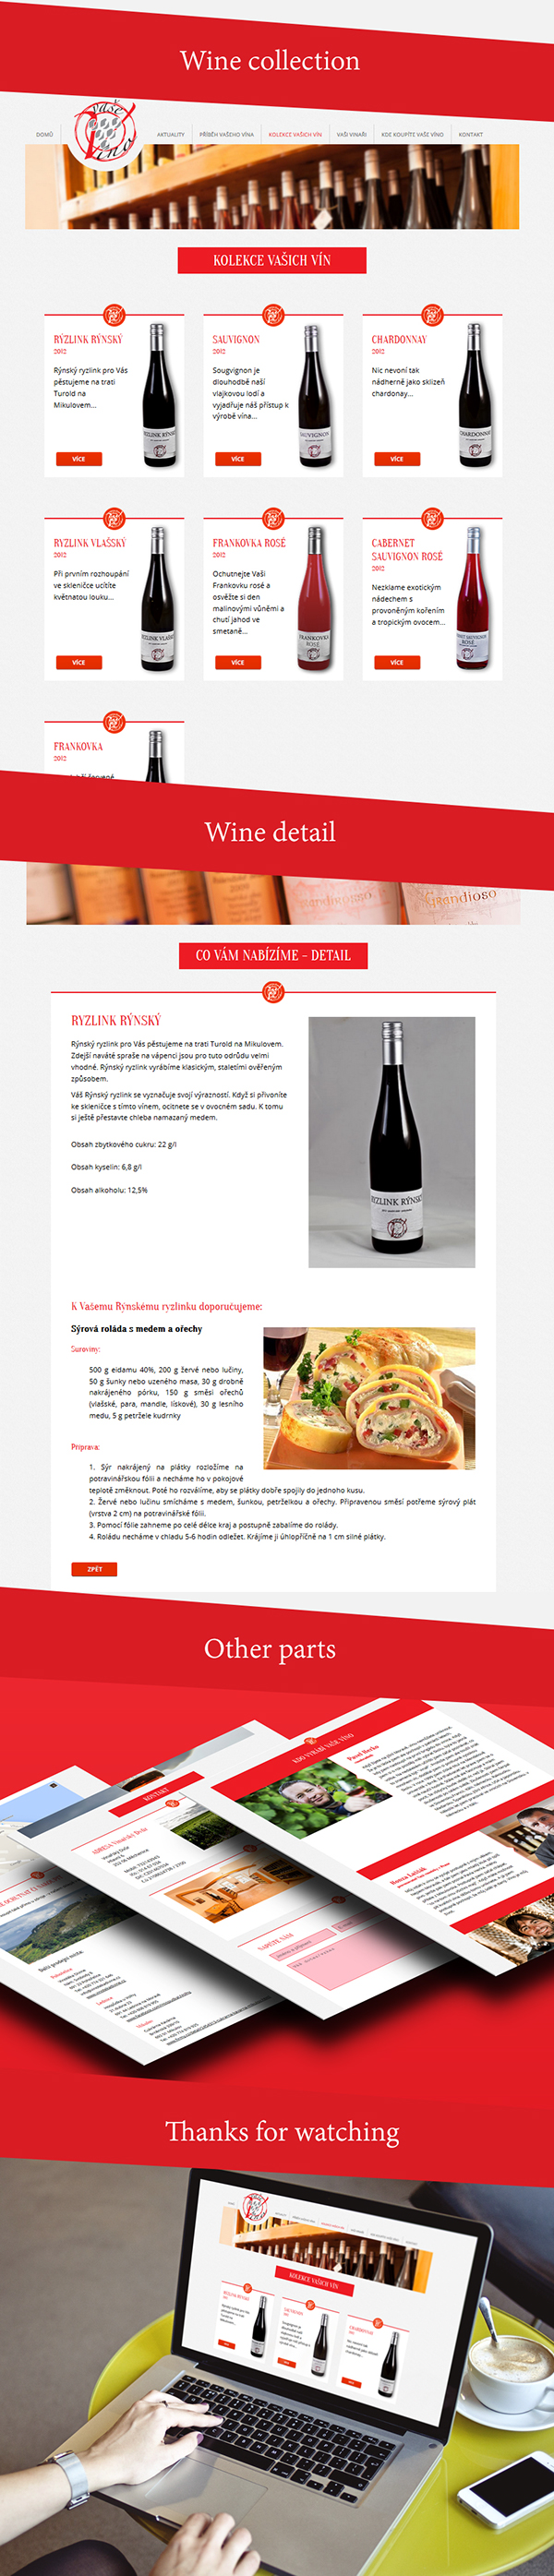 wine viticulture wine producer